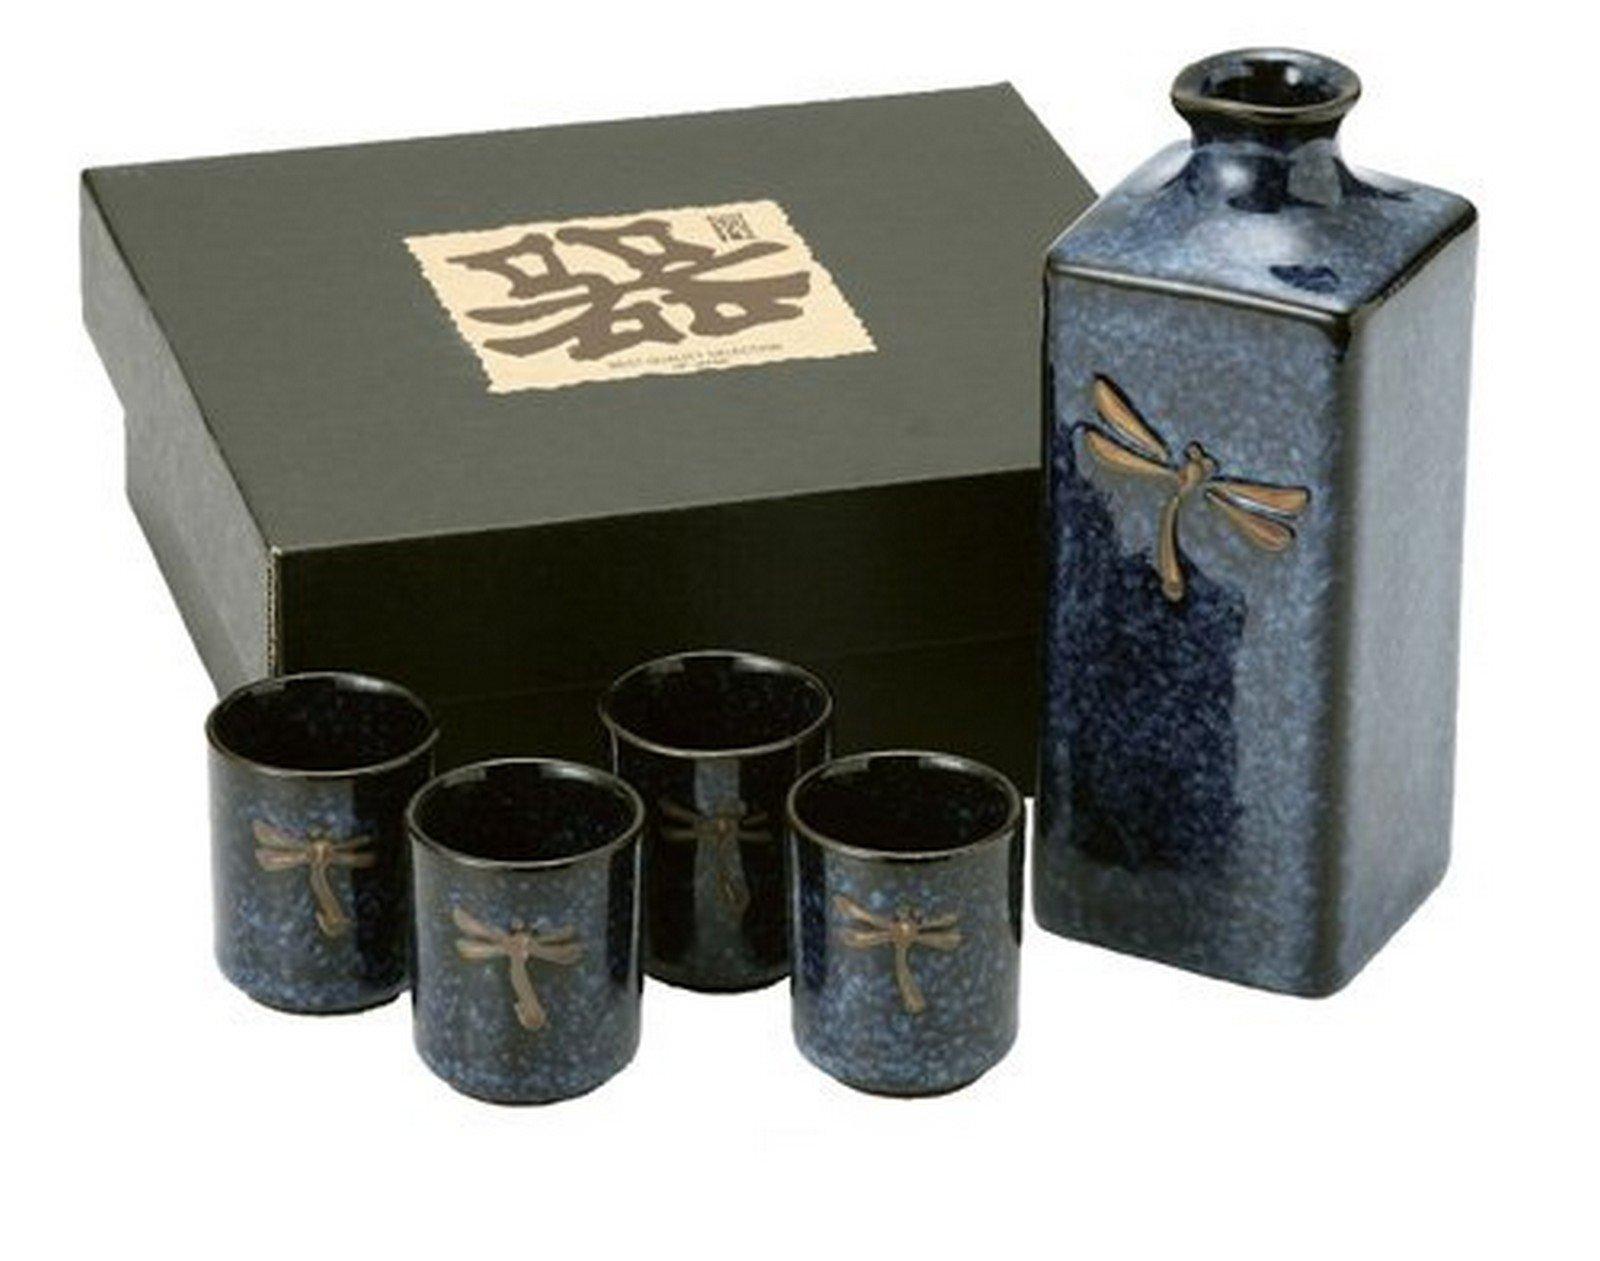 JapanBargain 1697 Dragonfly Sake Set, Navy